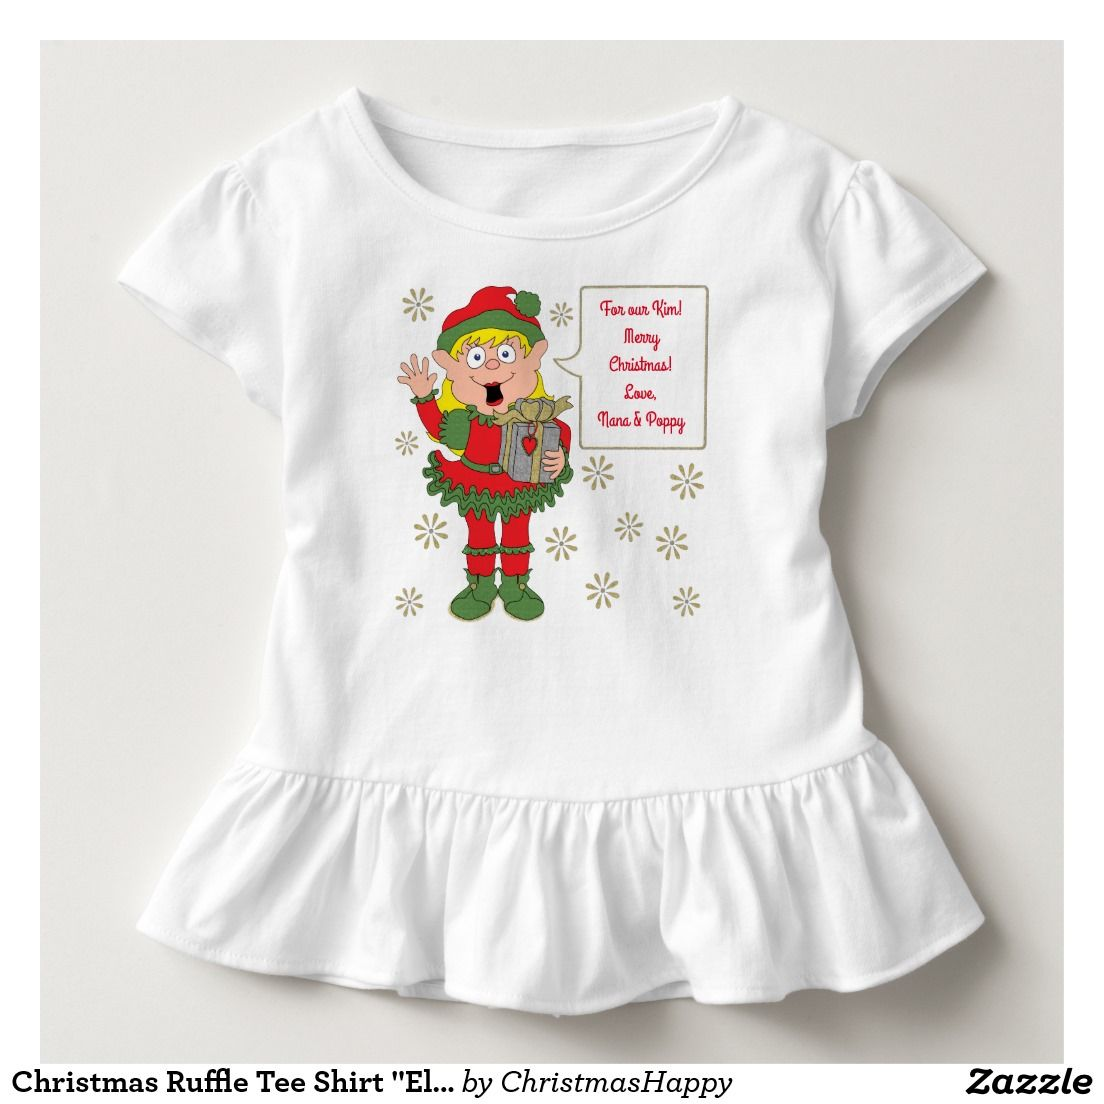 "Christmas Ruffle Tee Shirt ""Elf Gift Giving"""